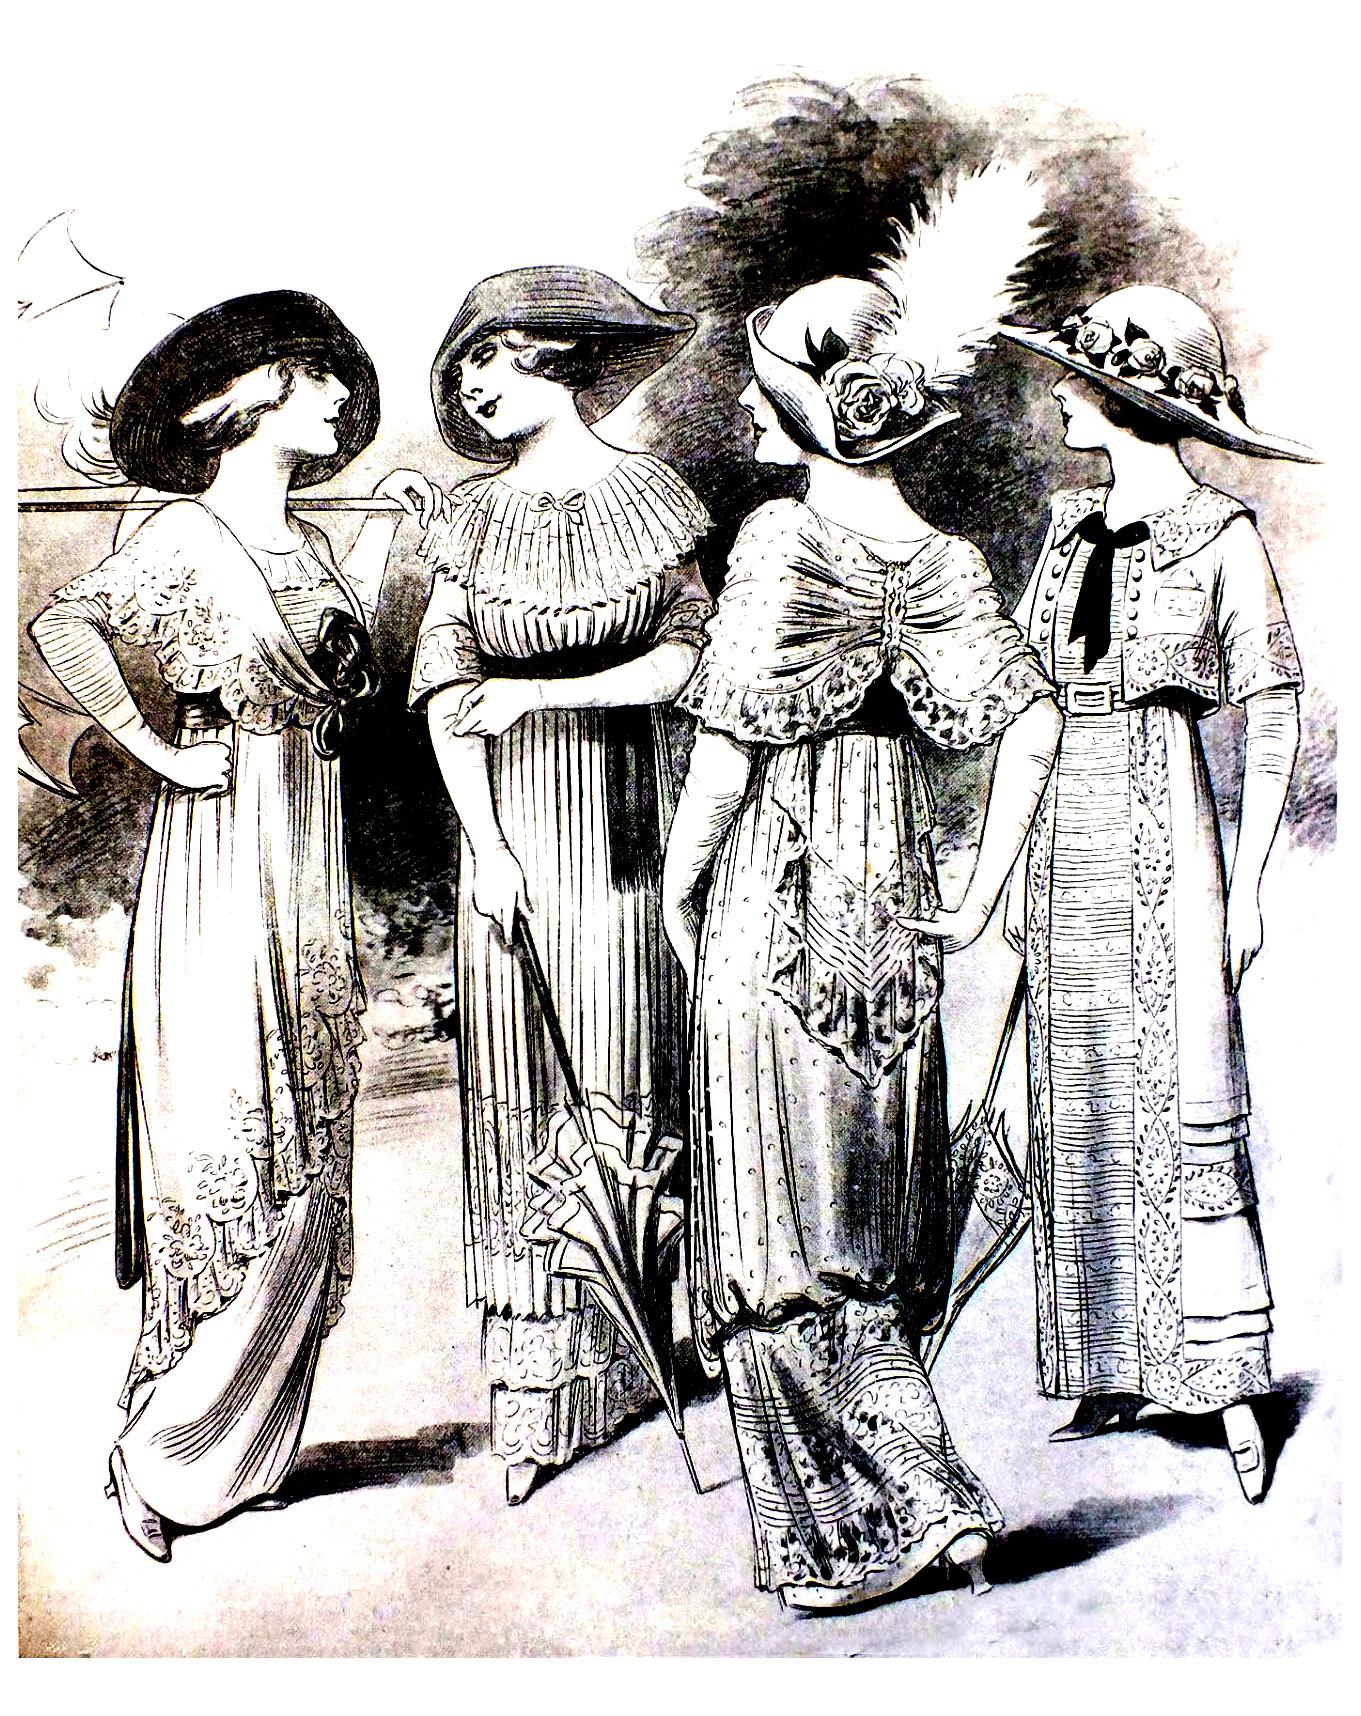 Colorear para adultos : Fashion & clothing - 8